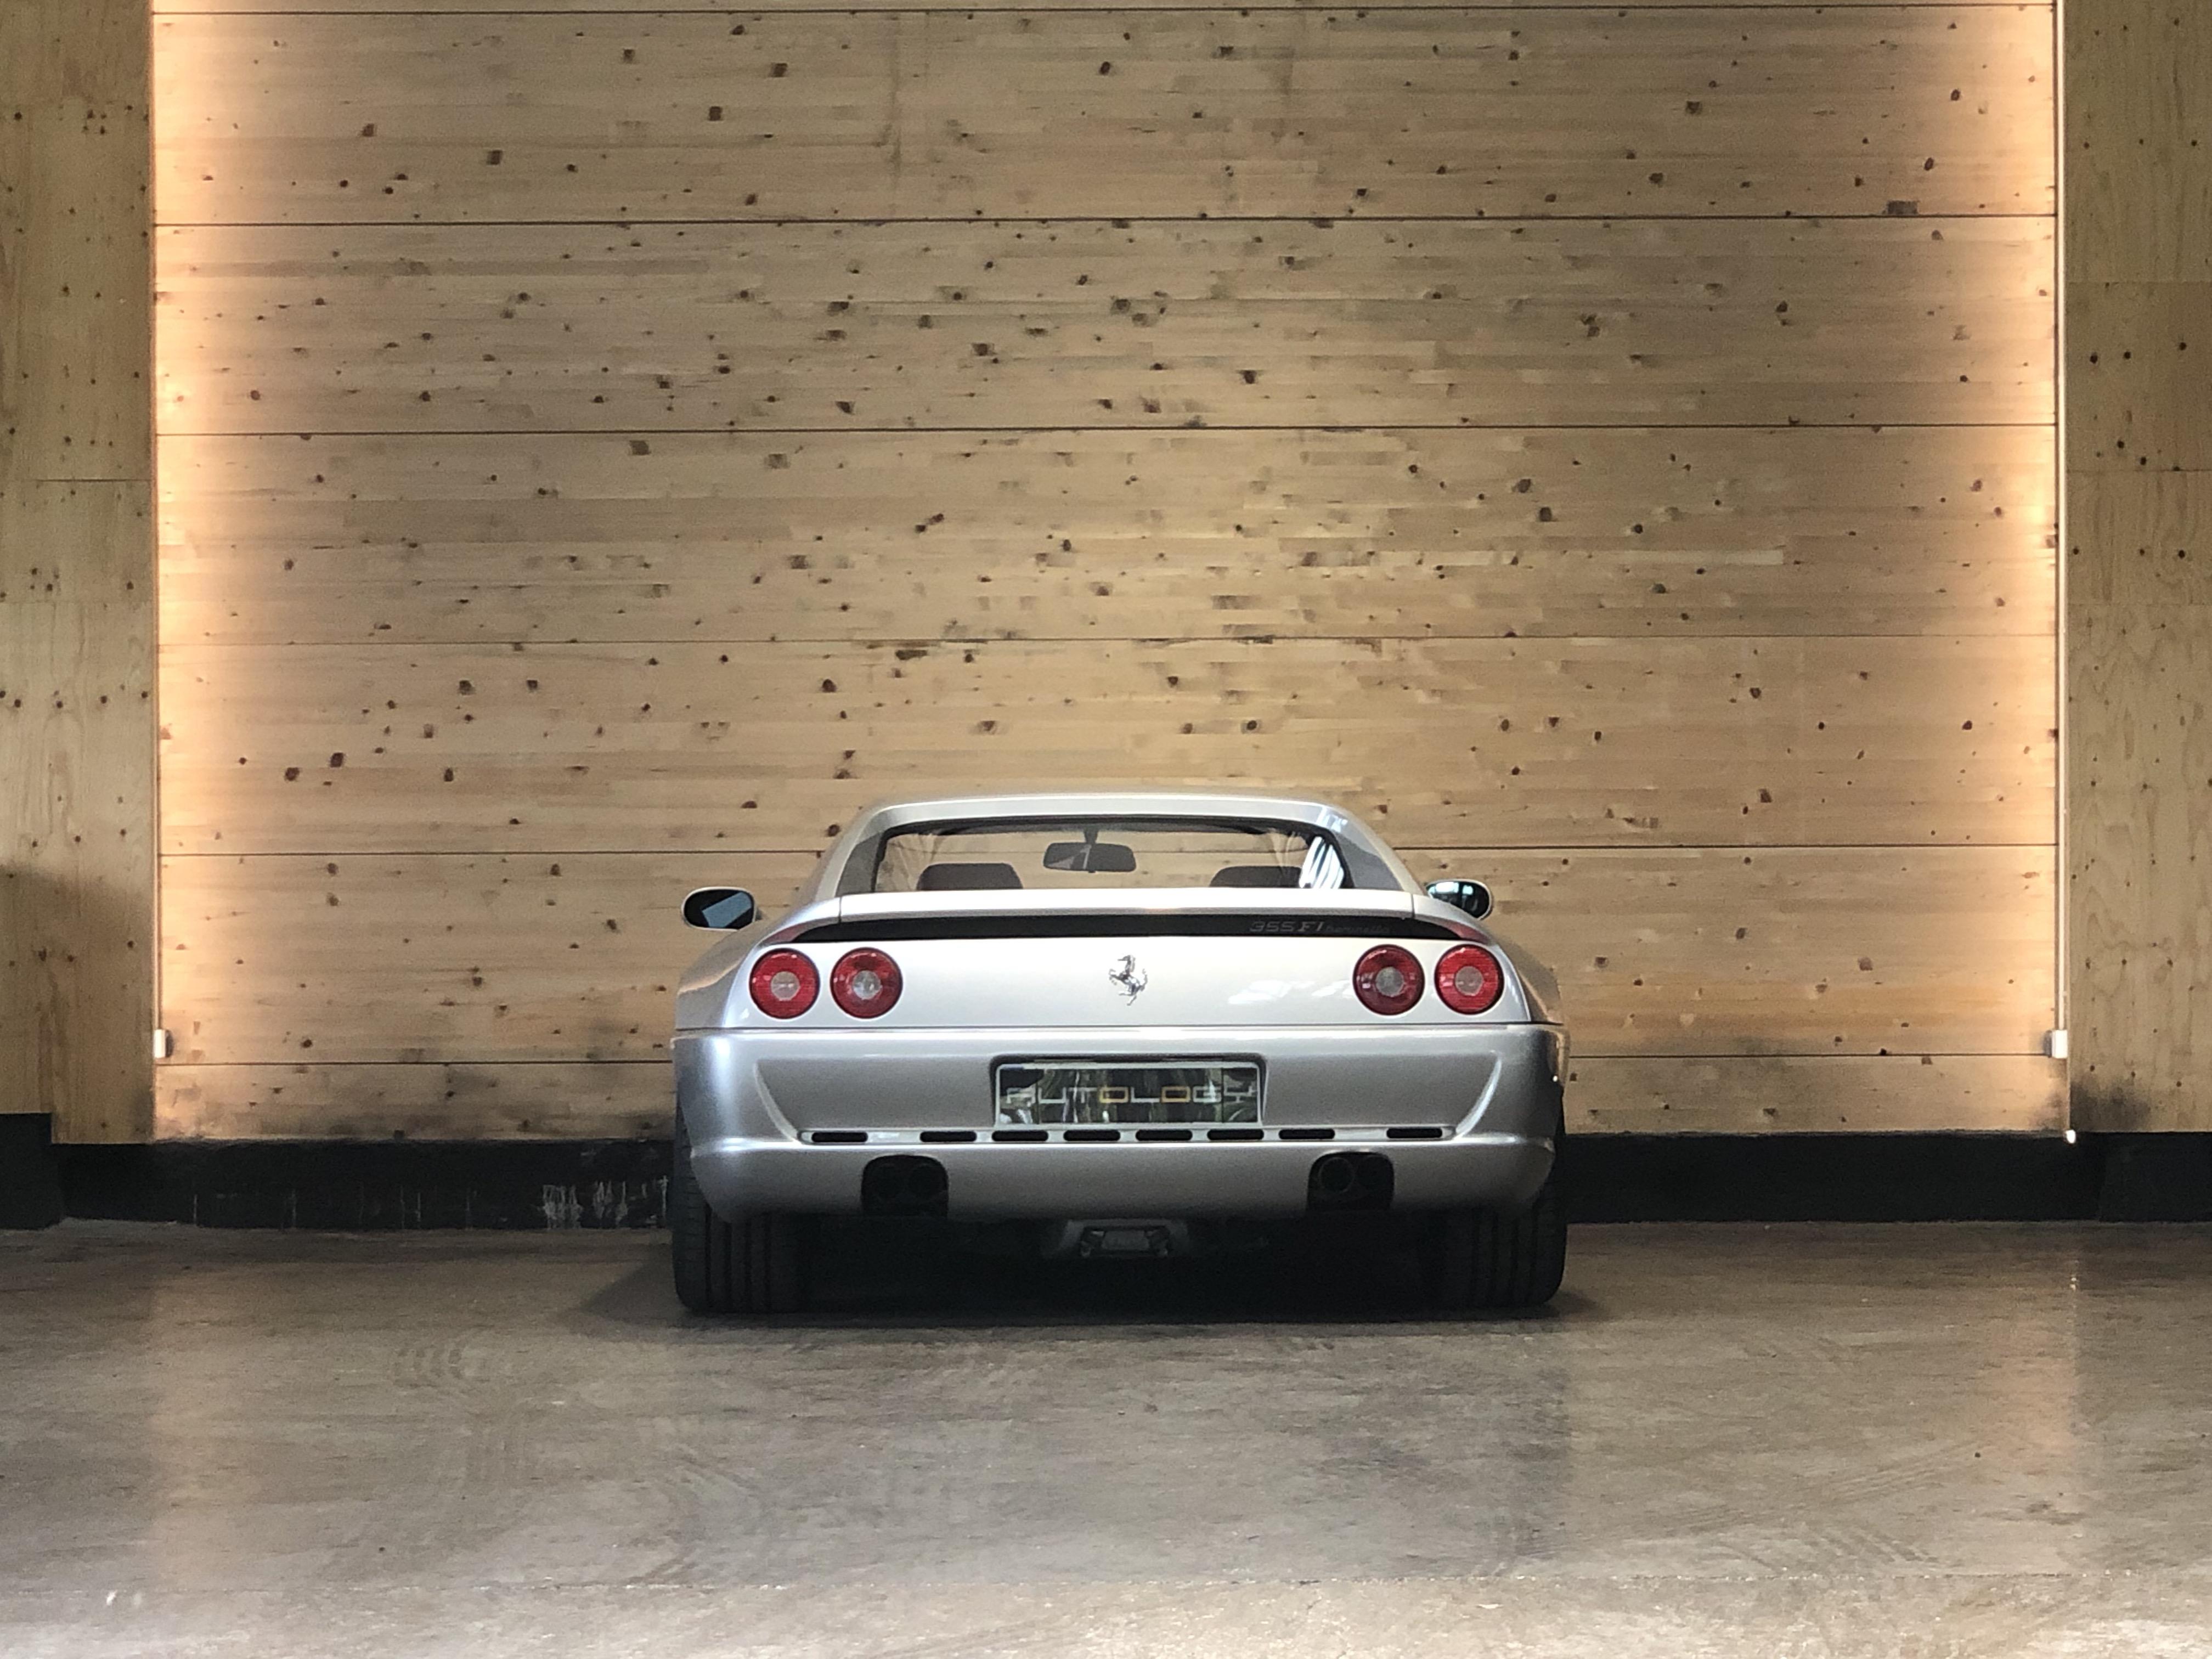 Ferrari F355 F1 Berlinette